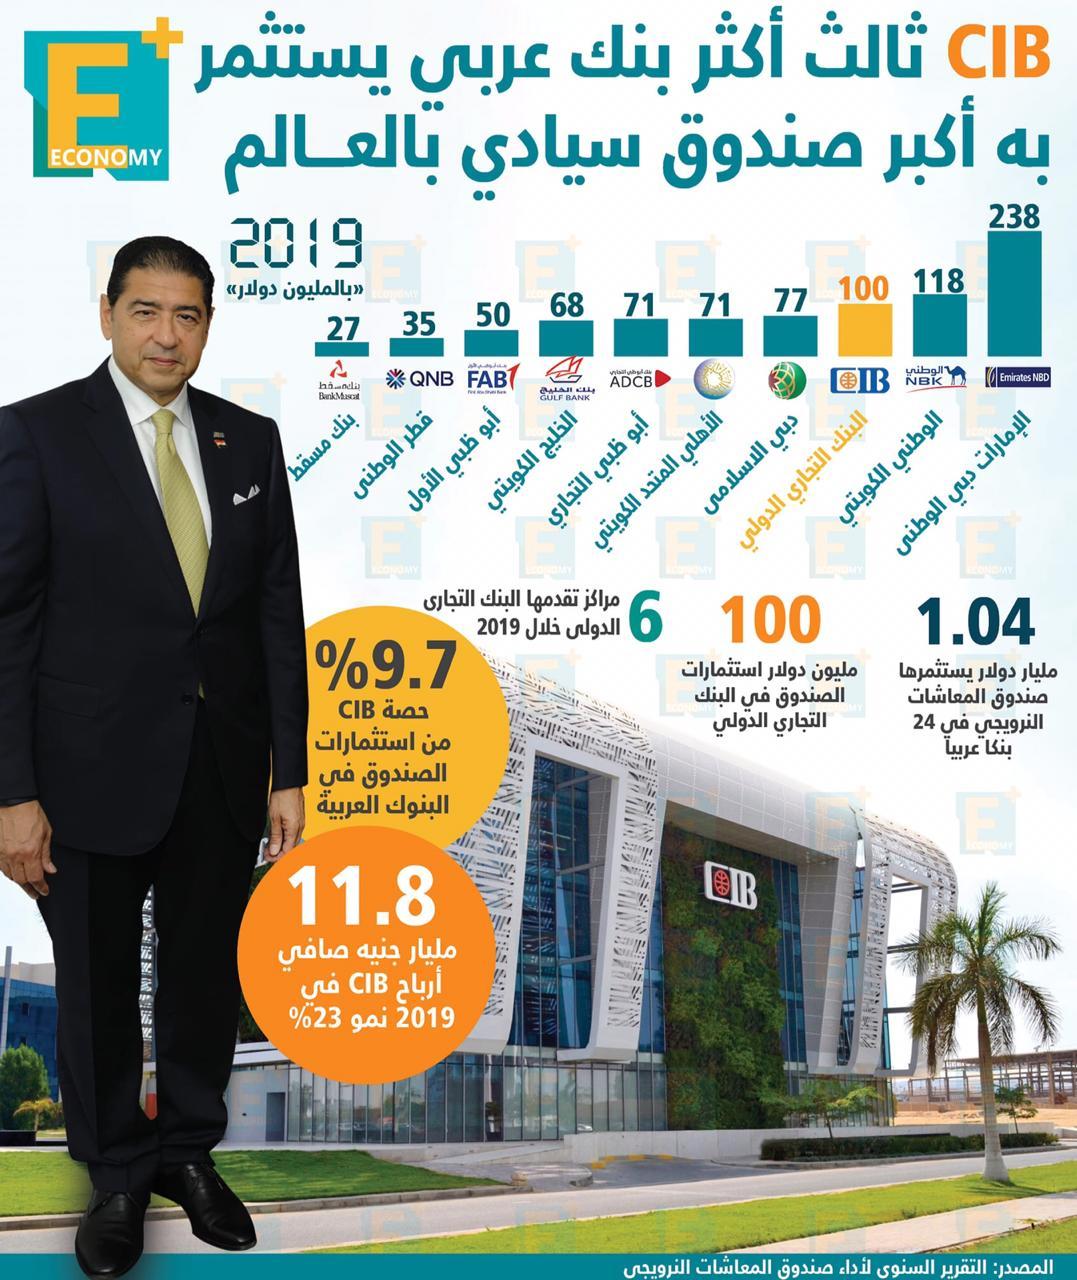 CIB ثالث أكثر بنك عربي يستثمر به أكبر صندوق سيادي بالعالم في 2019